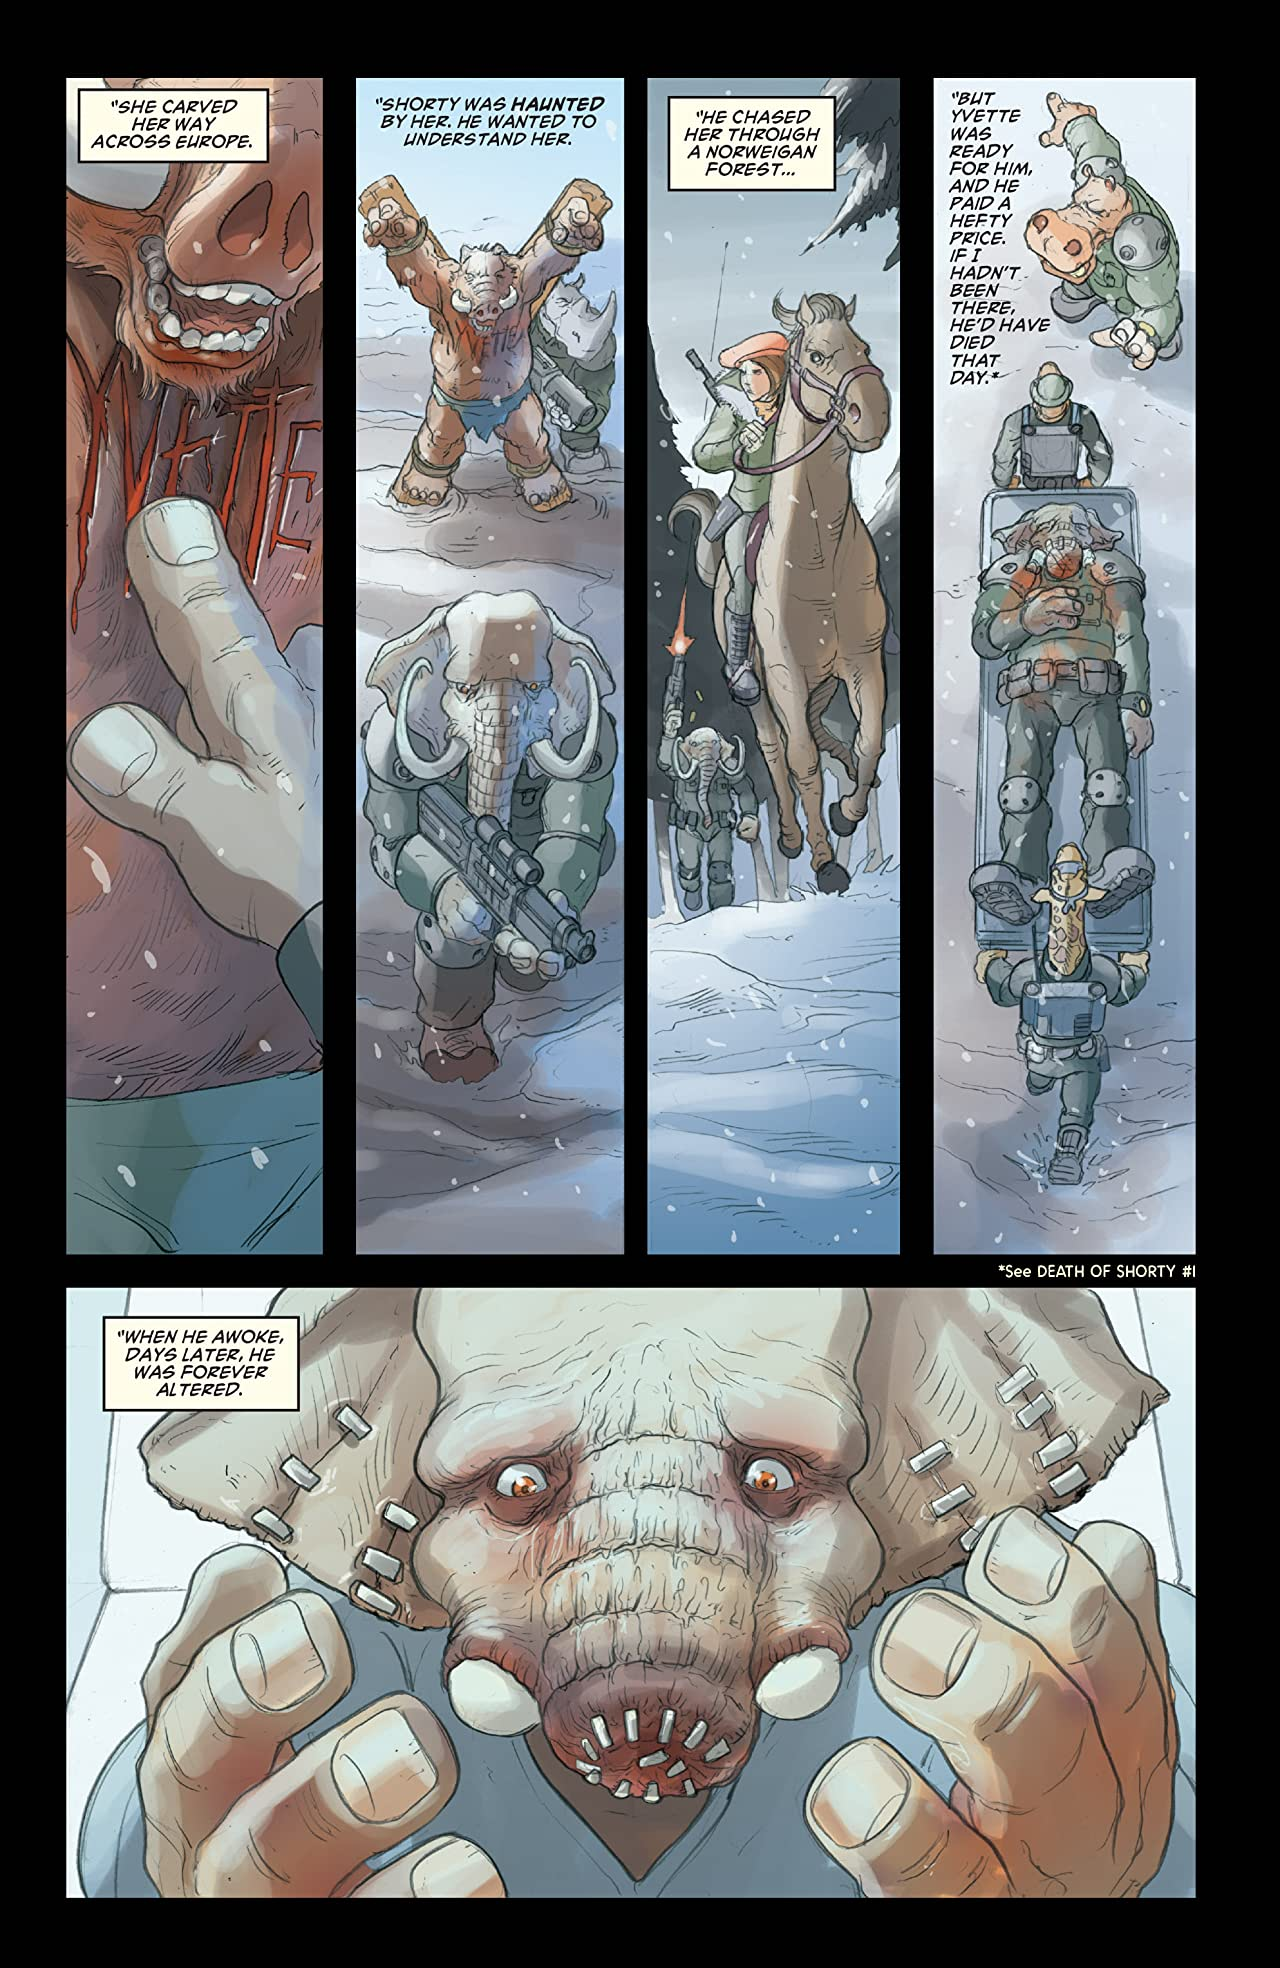 Elephantmen 2261: The Death of Shorty (comiXology Originals) #4 (of 5)